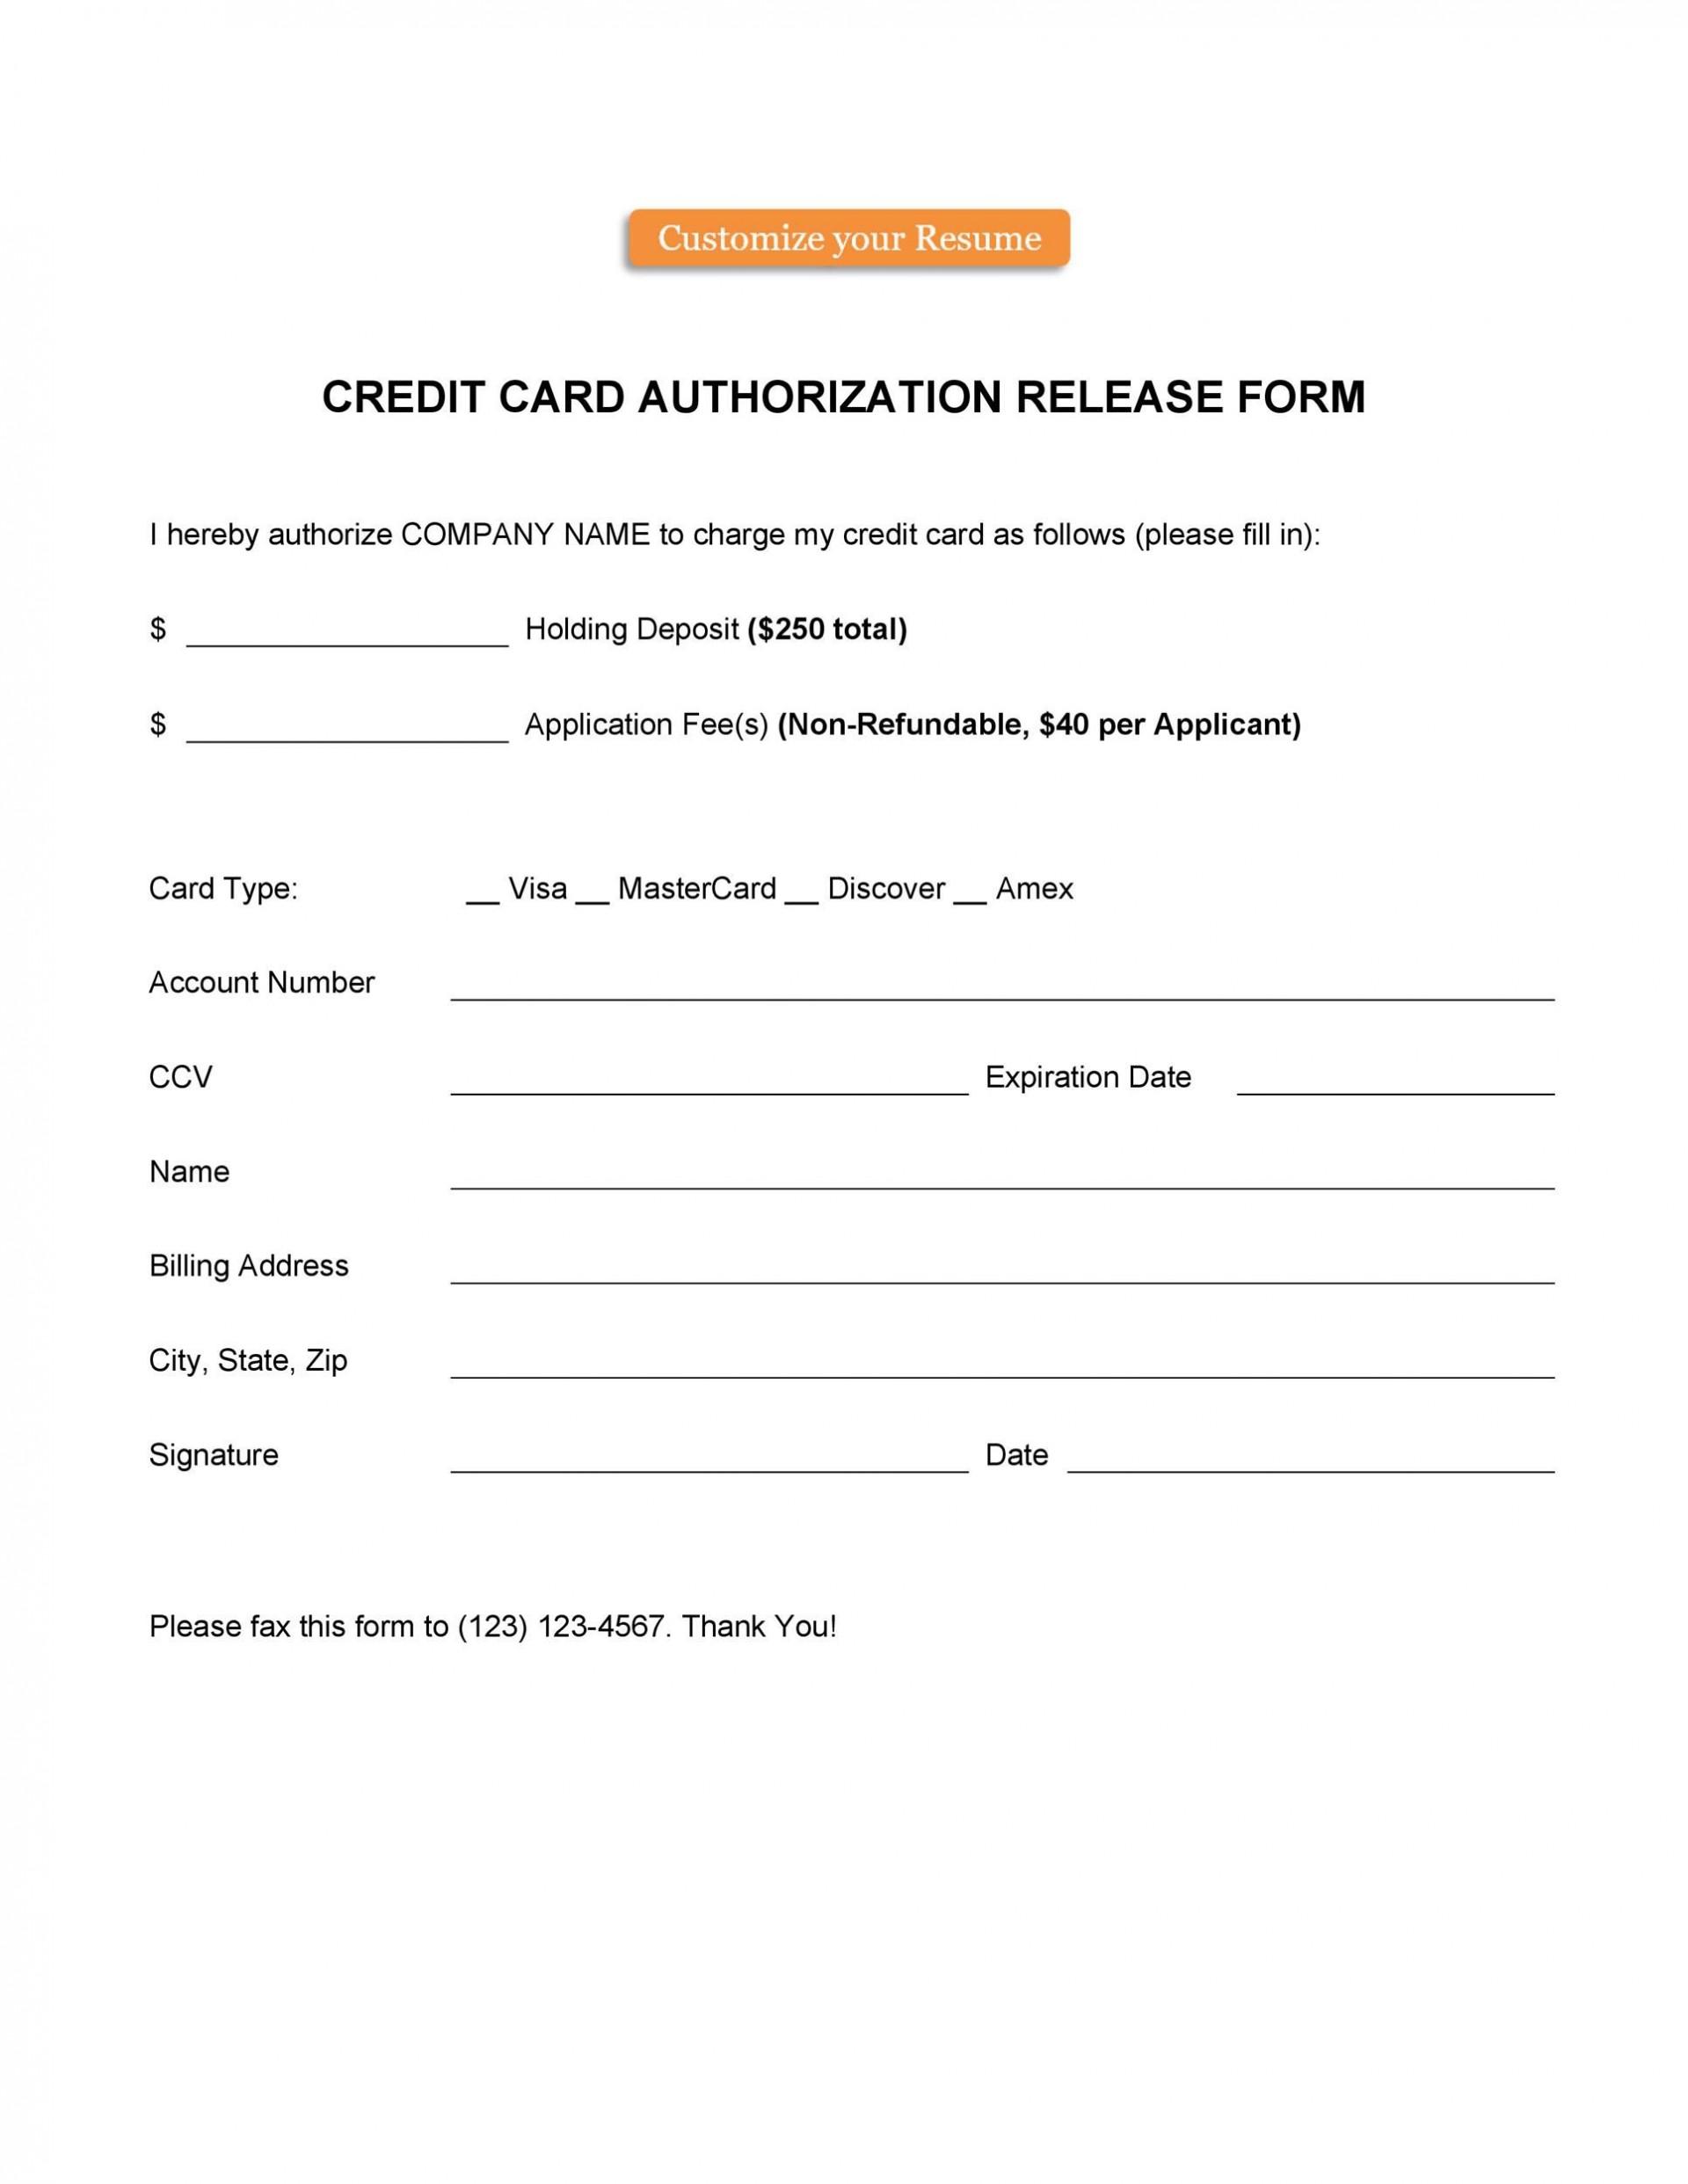 006 Impressive Credit Card Payment Form Template Pdf Image  Authorization1920